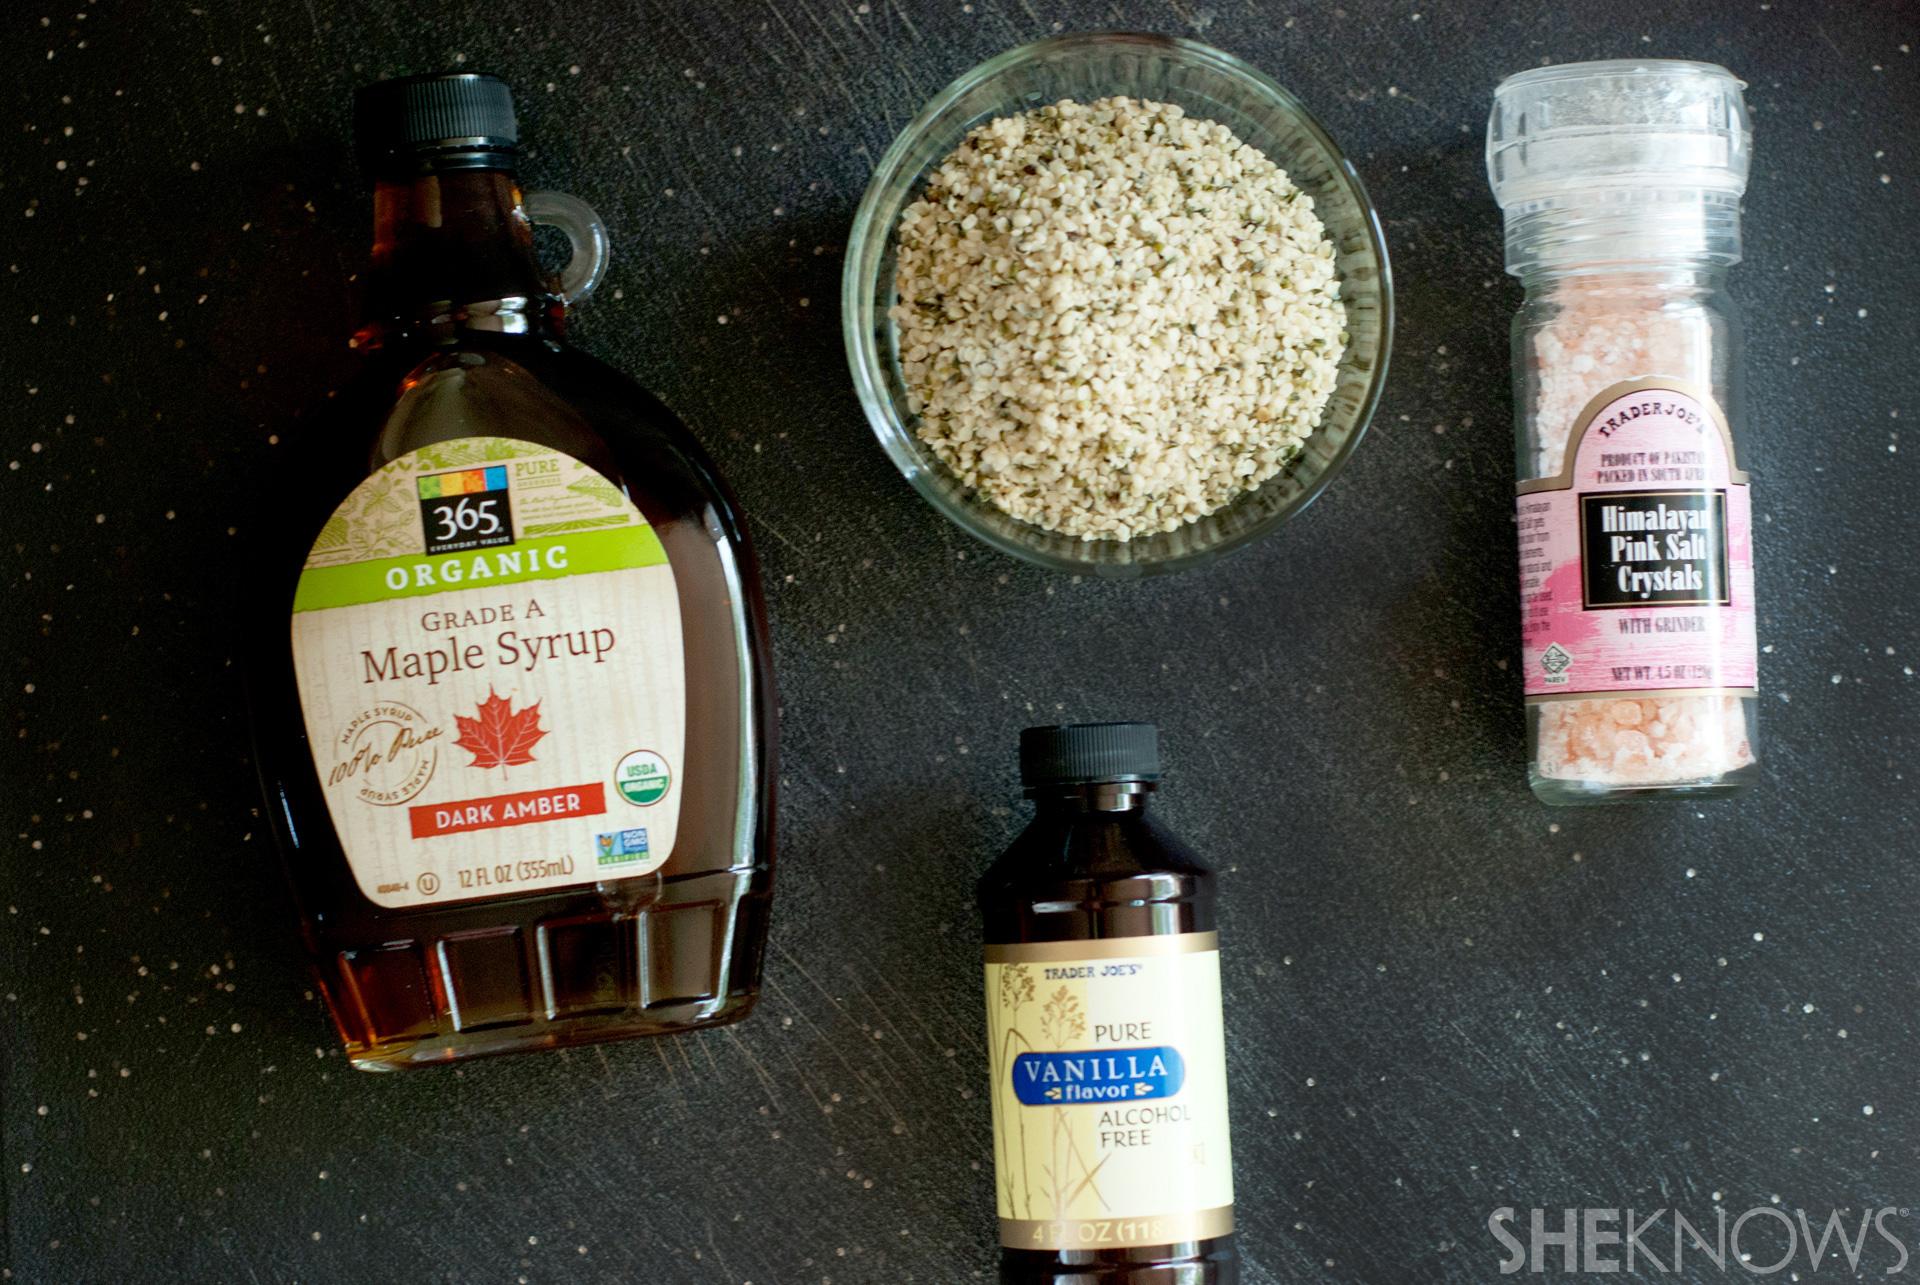 maple-vanilla hemp milk: Ingredients